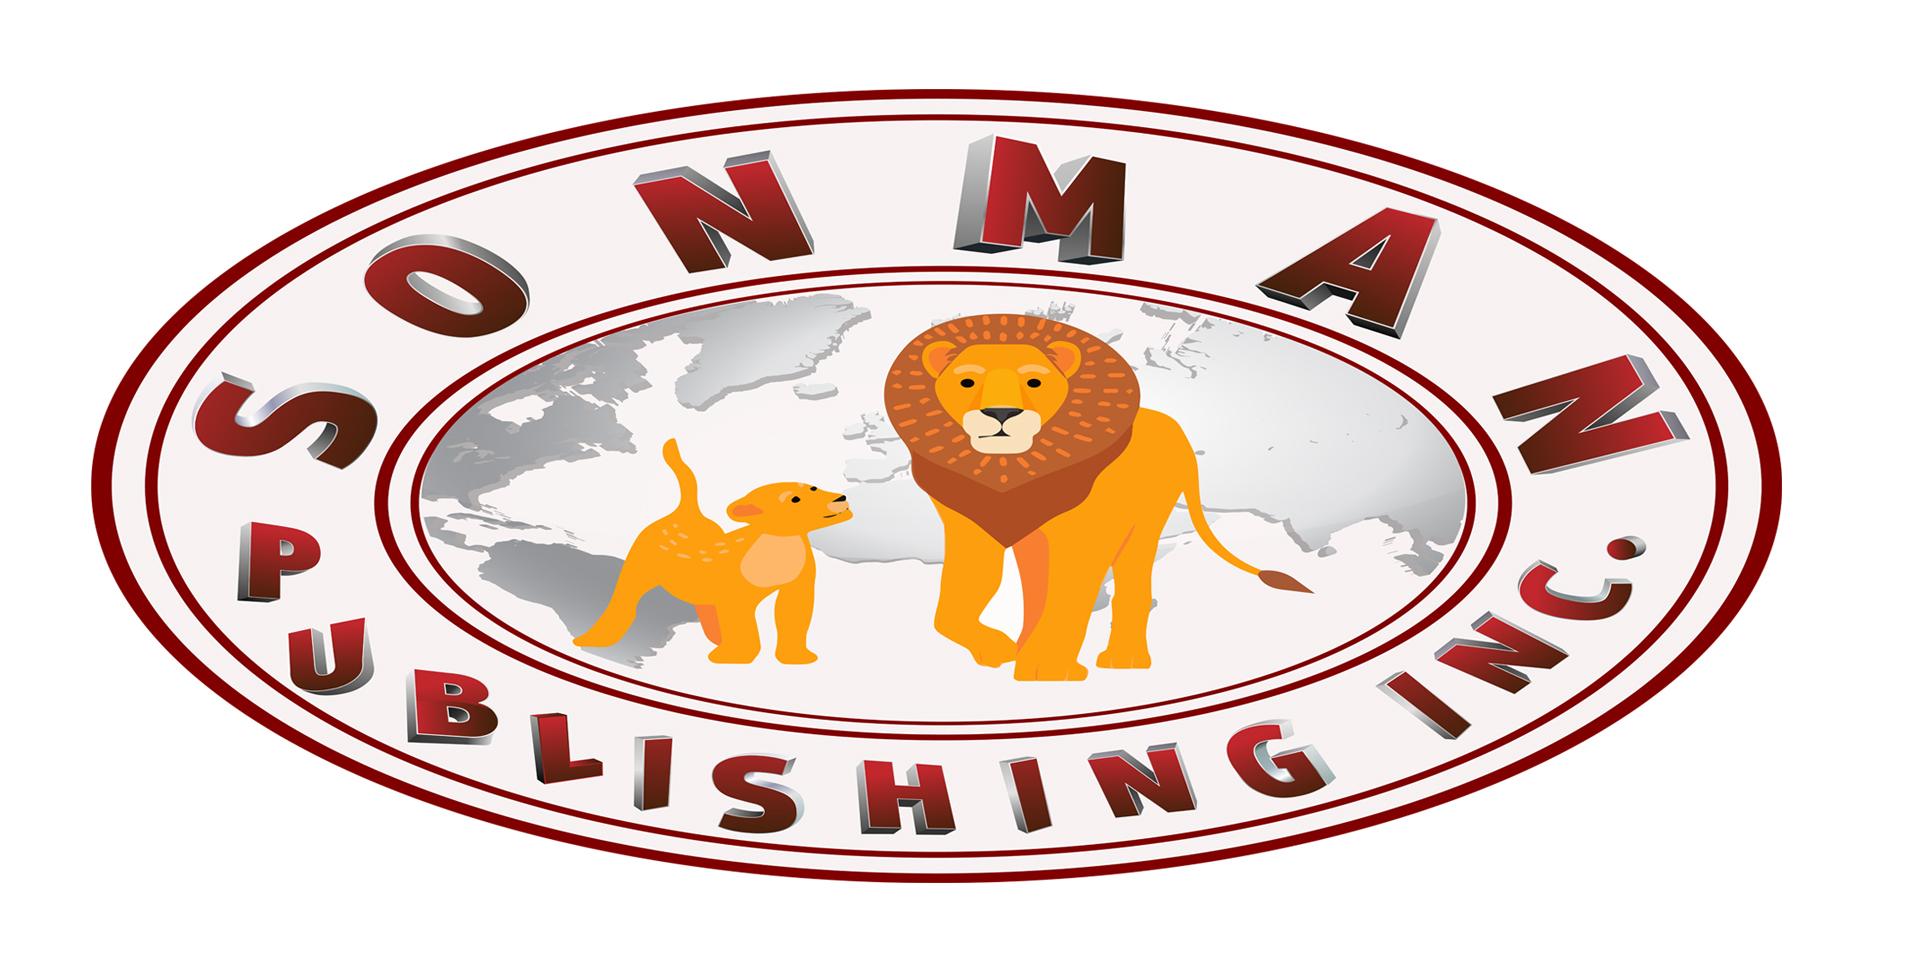 sonMan_Publishing_logo_wht_bg2